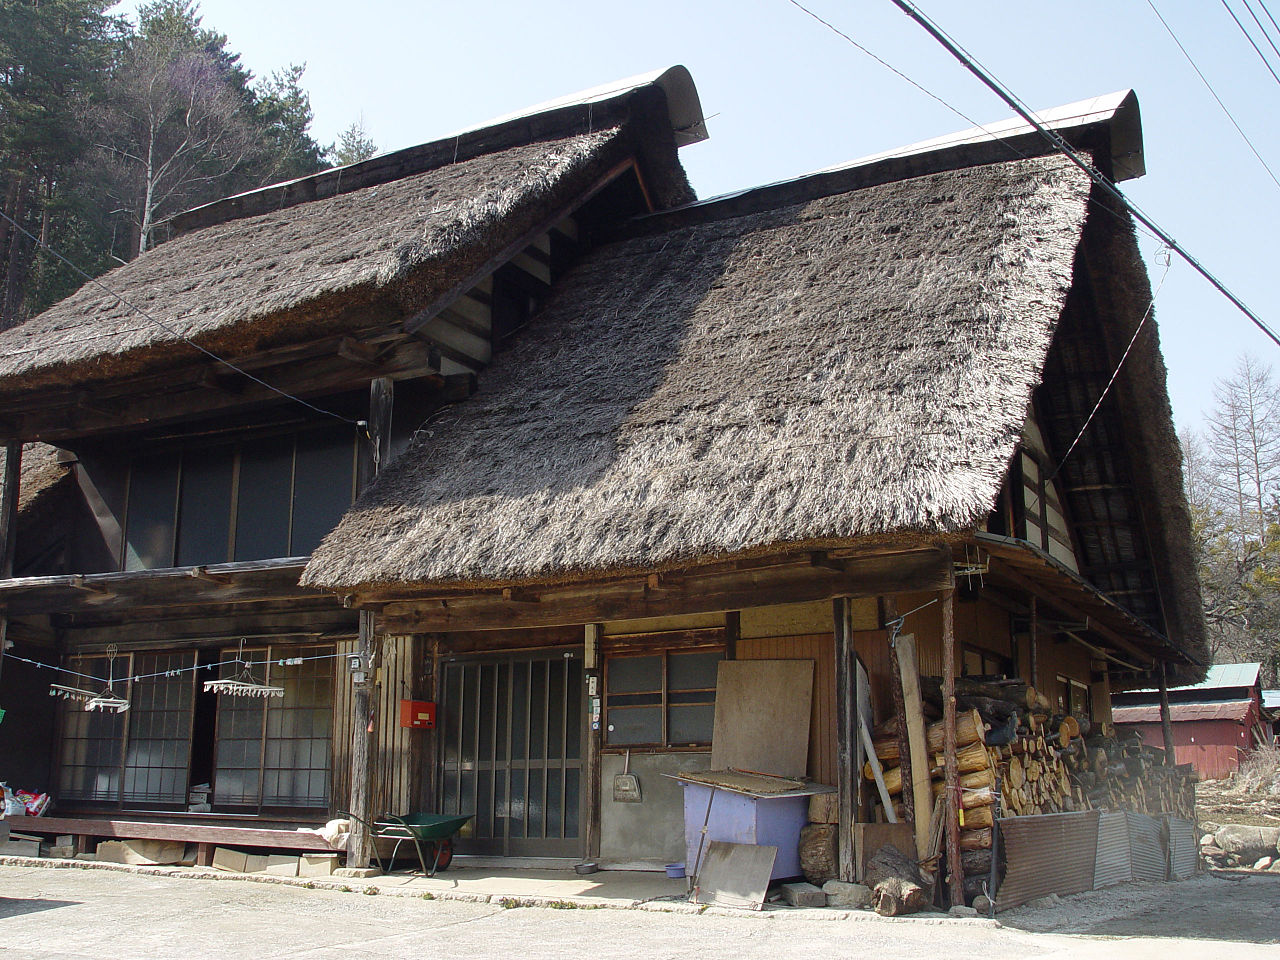 File Thatched Roof In Ichinose Enzan Yamanashi Jpg